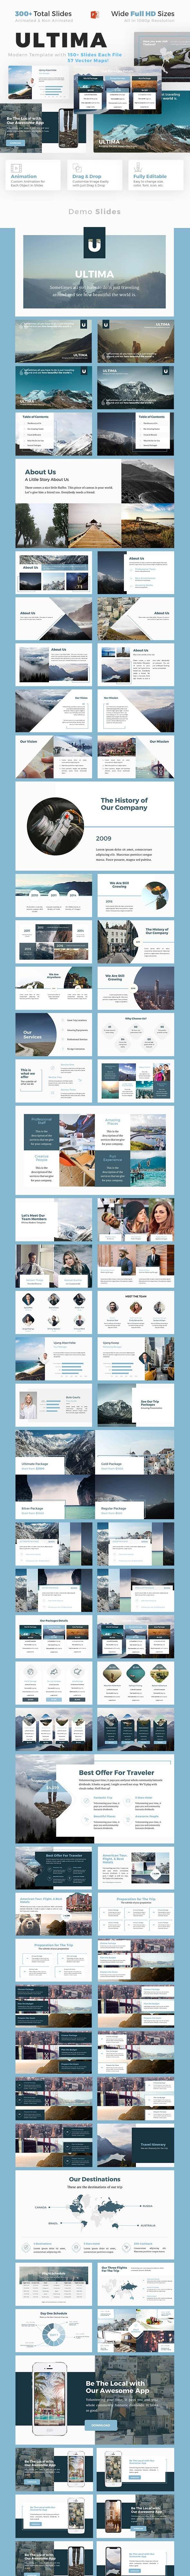 Modern Travel Presentation - Ultima - PowerPoint Templates Presentation Templates